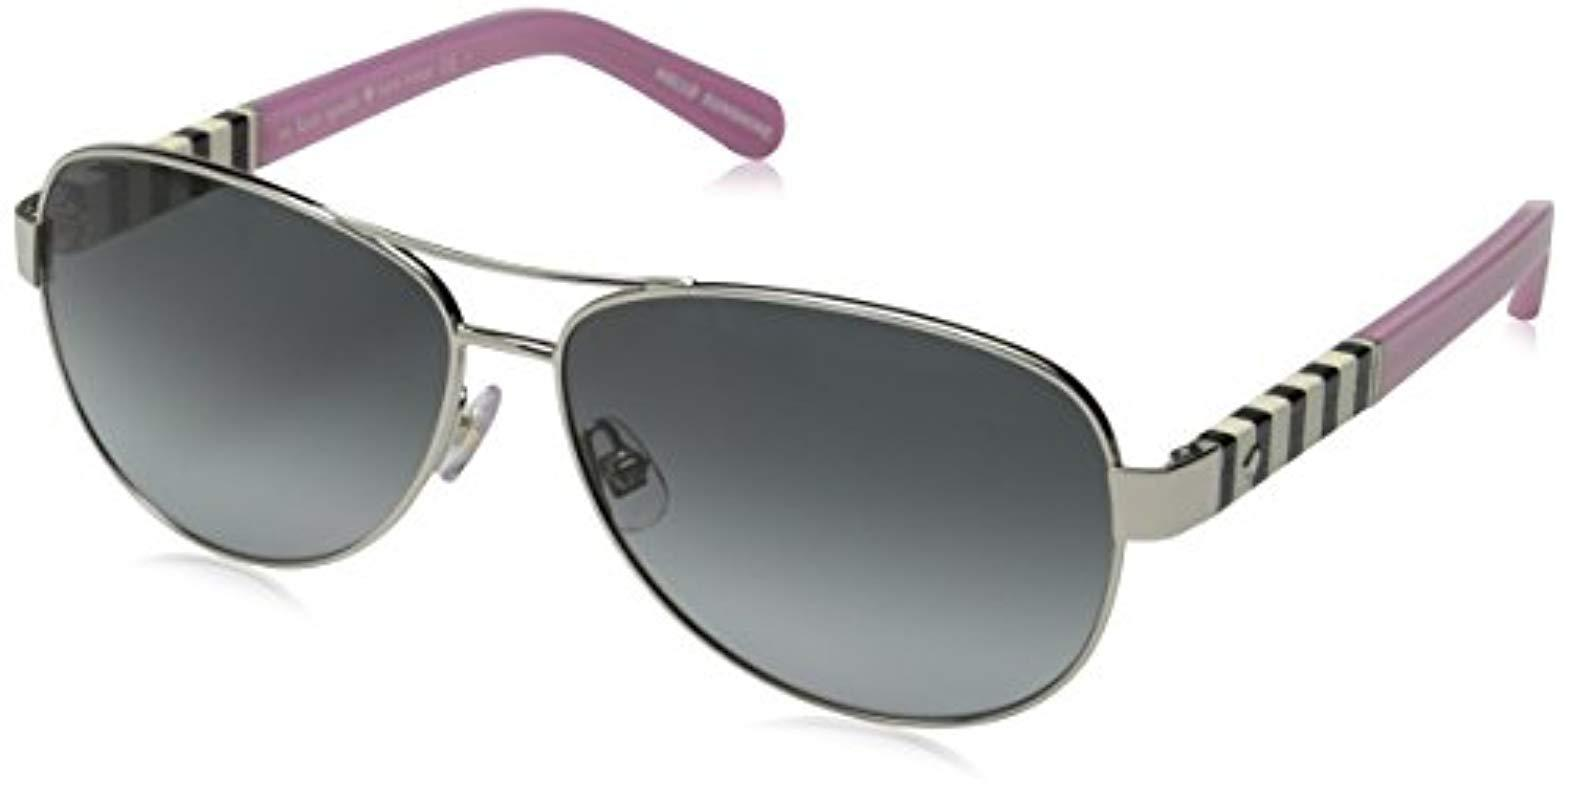 301533fdc78d5 Kate Spade Kate Spade Dalia Aviator Sunglasses - Save 3% - Lyst